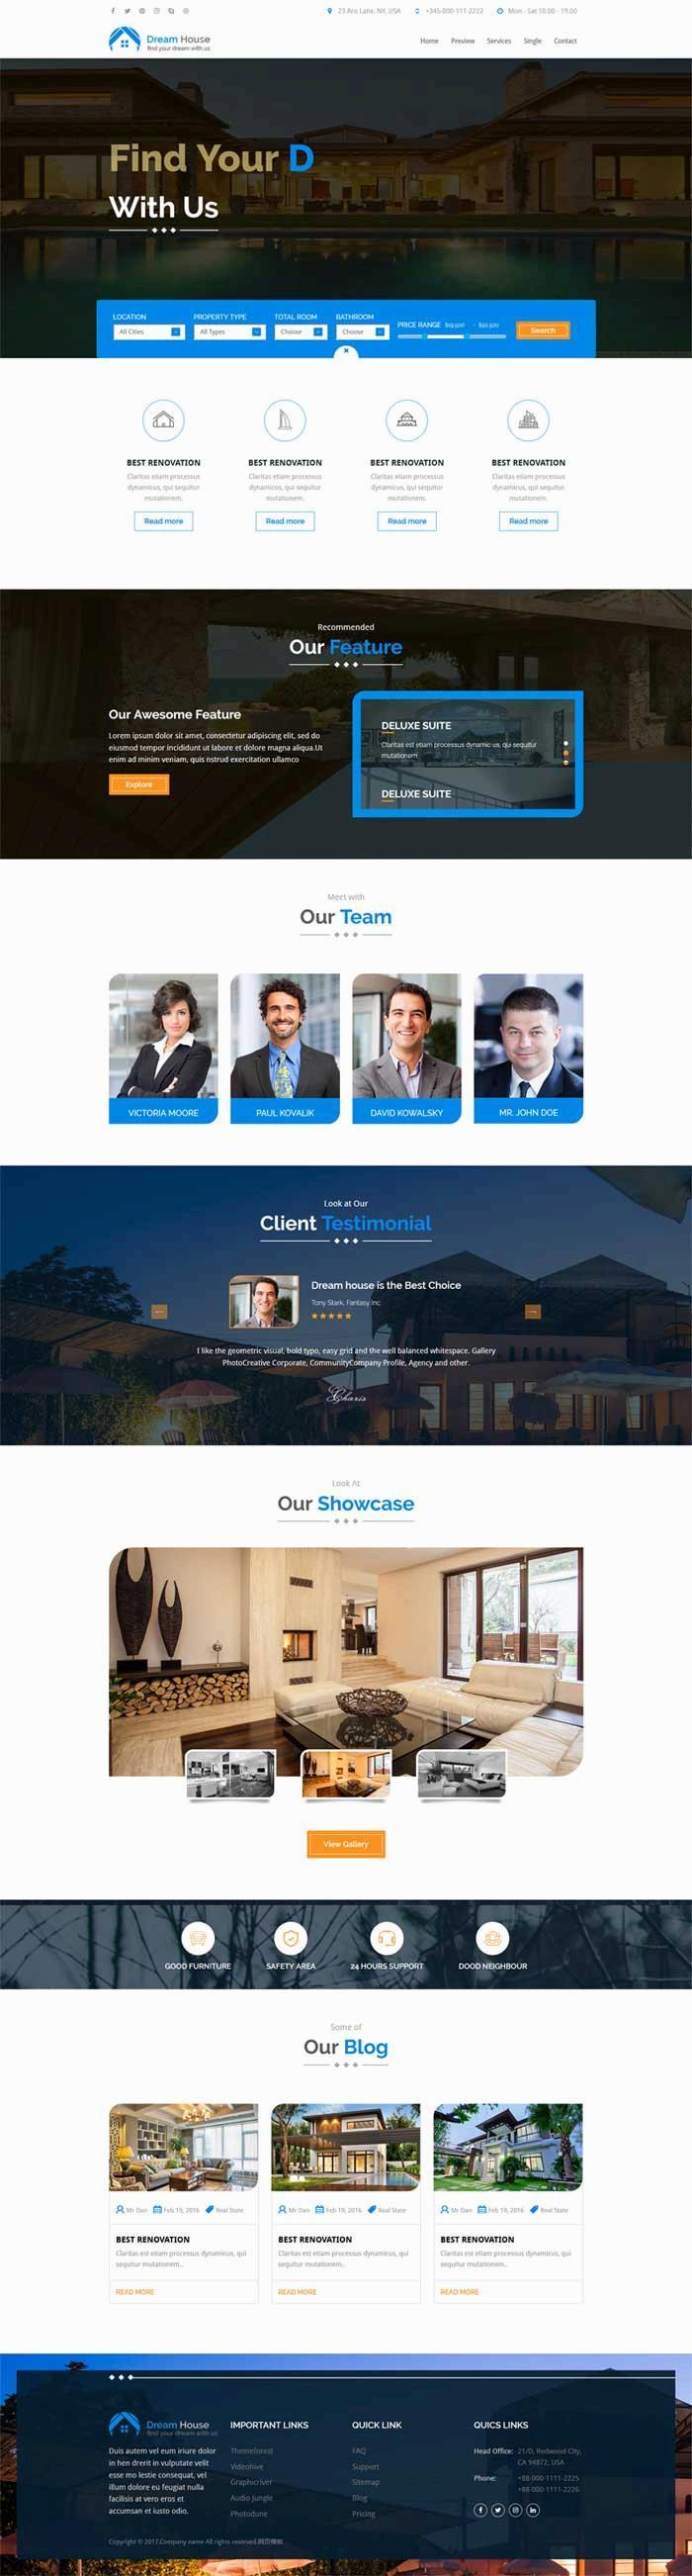 html5蓝色大气的房产销售网站模板